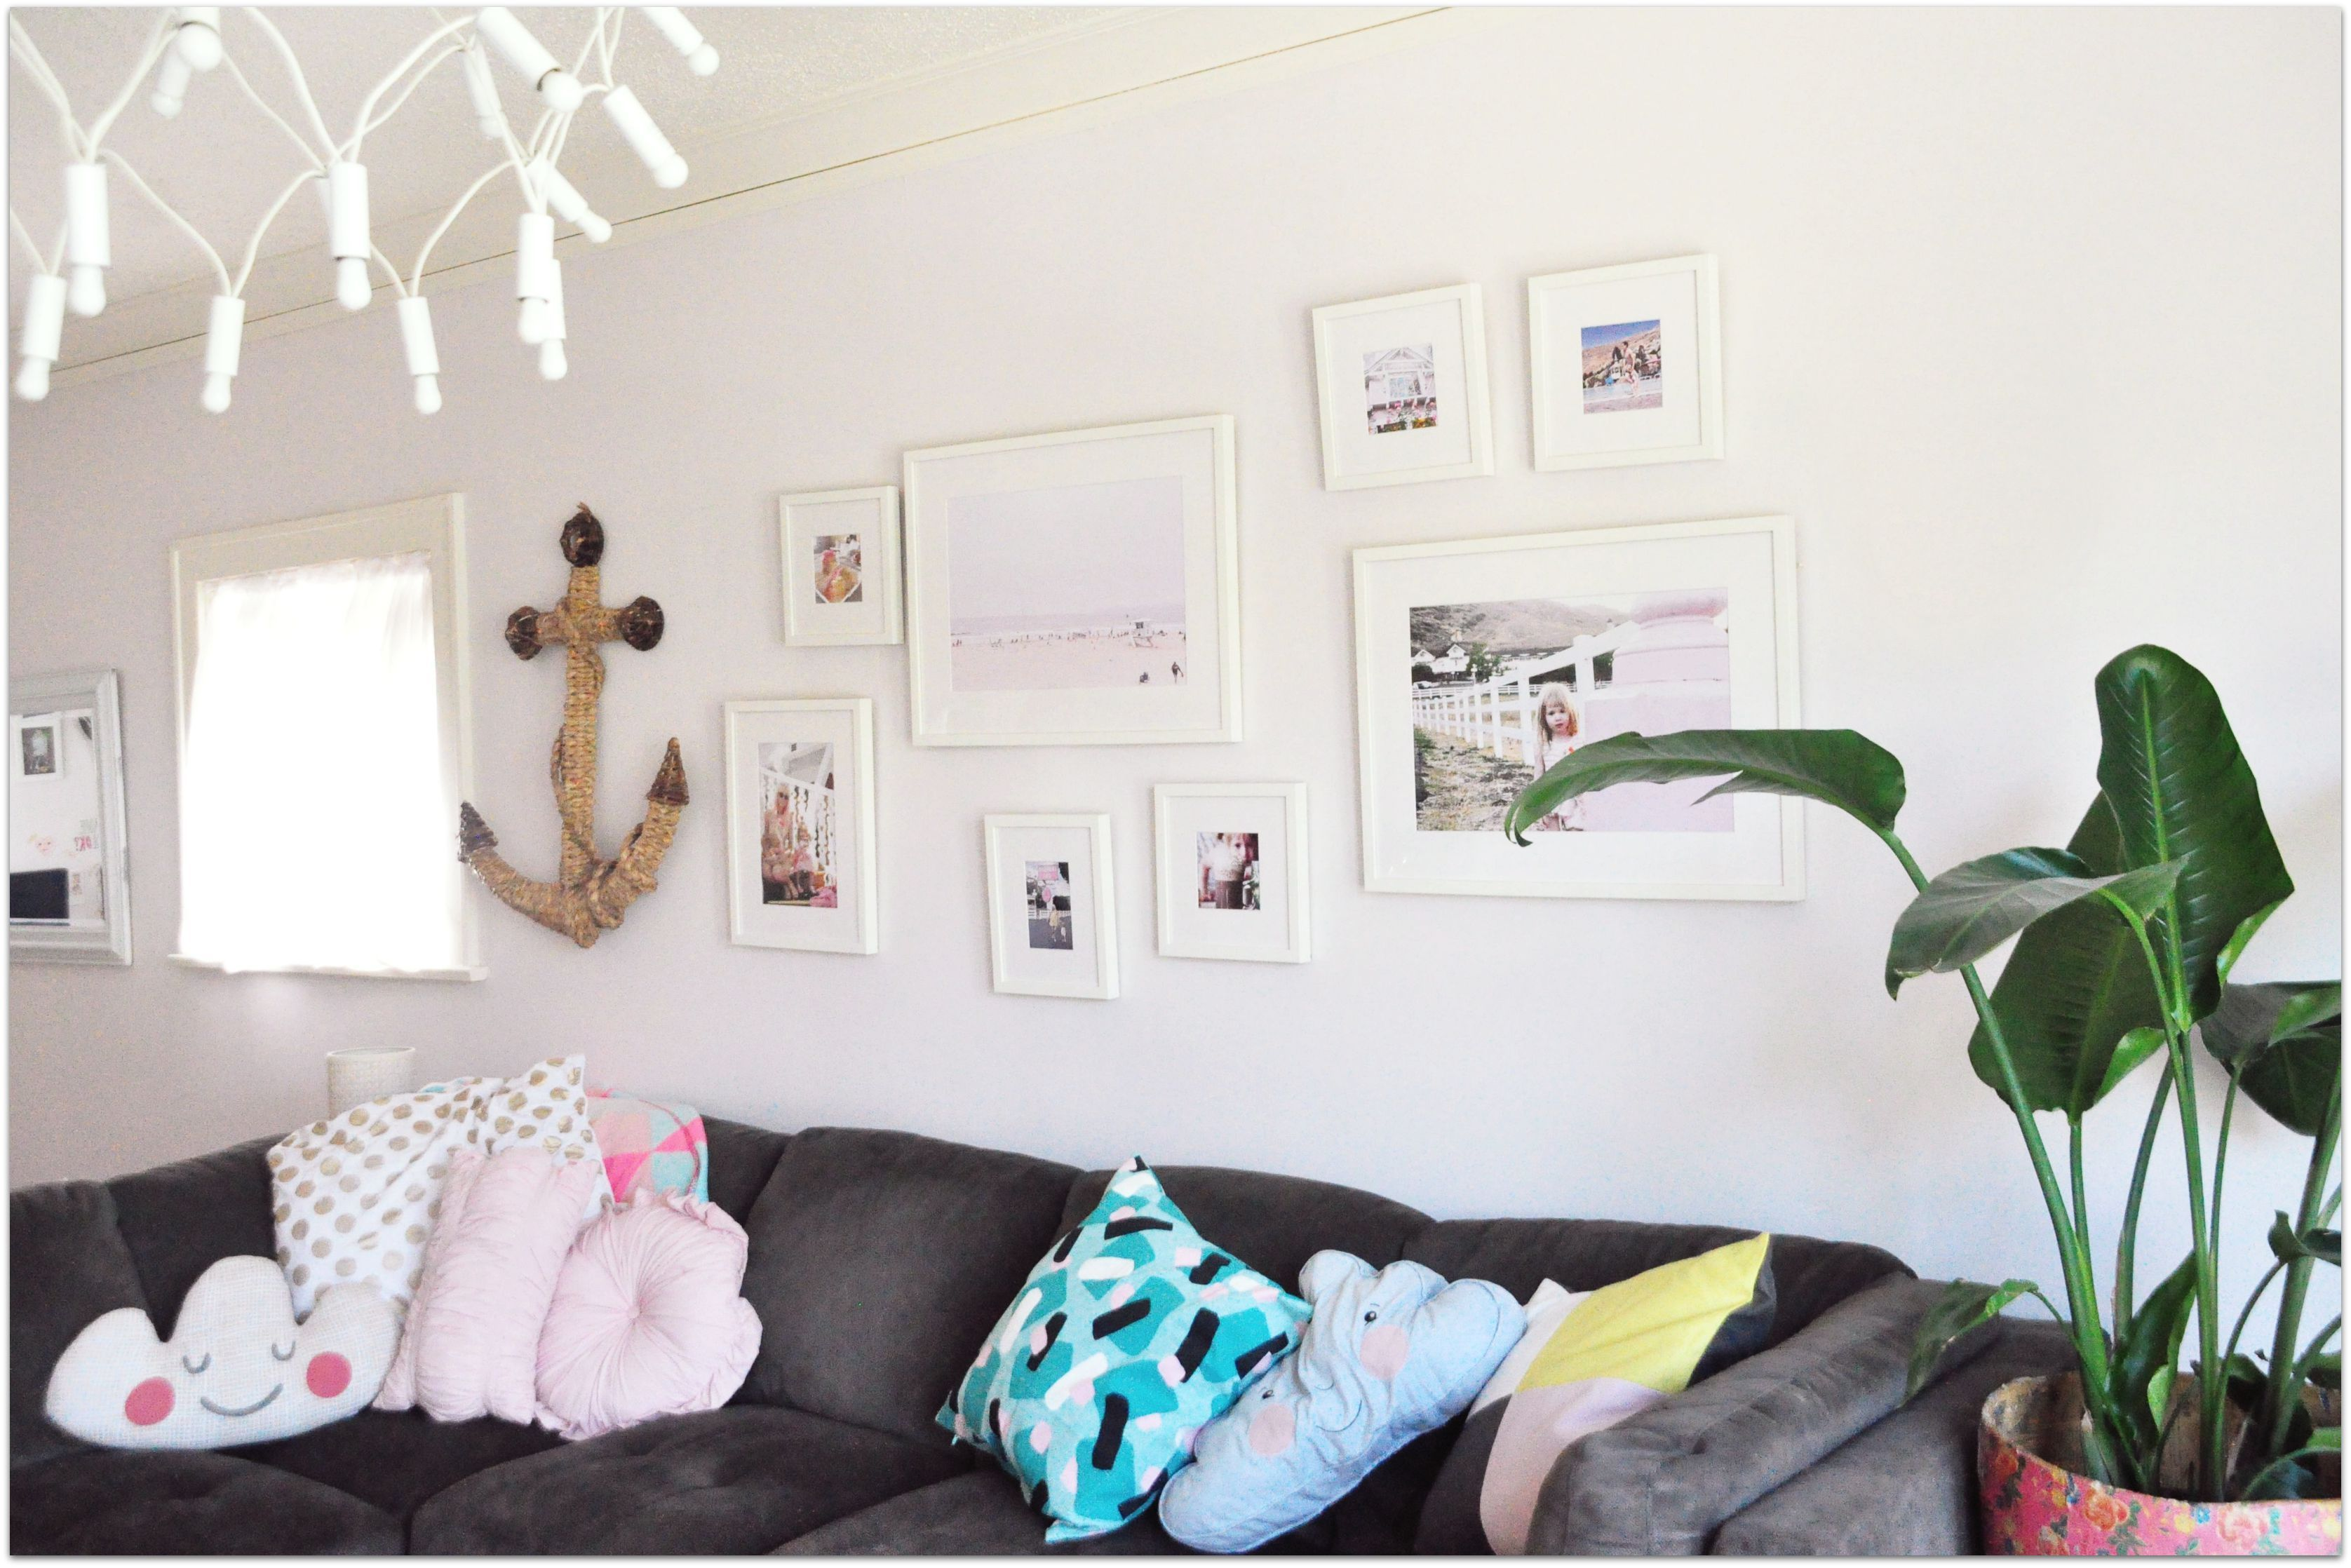 Blogged about framing with @framebridge today. They are amazing. Do it. #framebridge